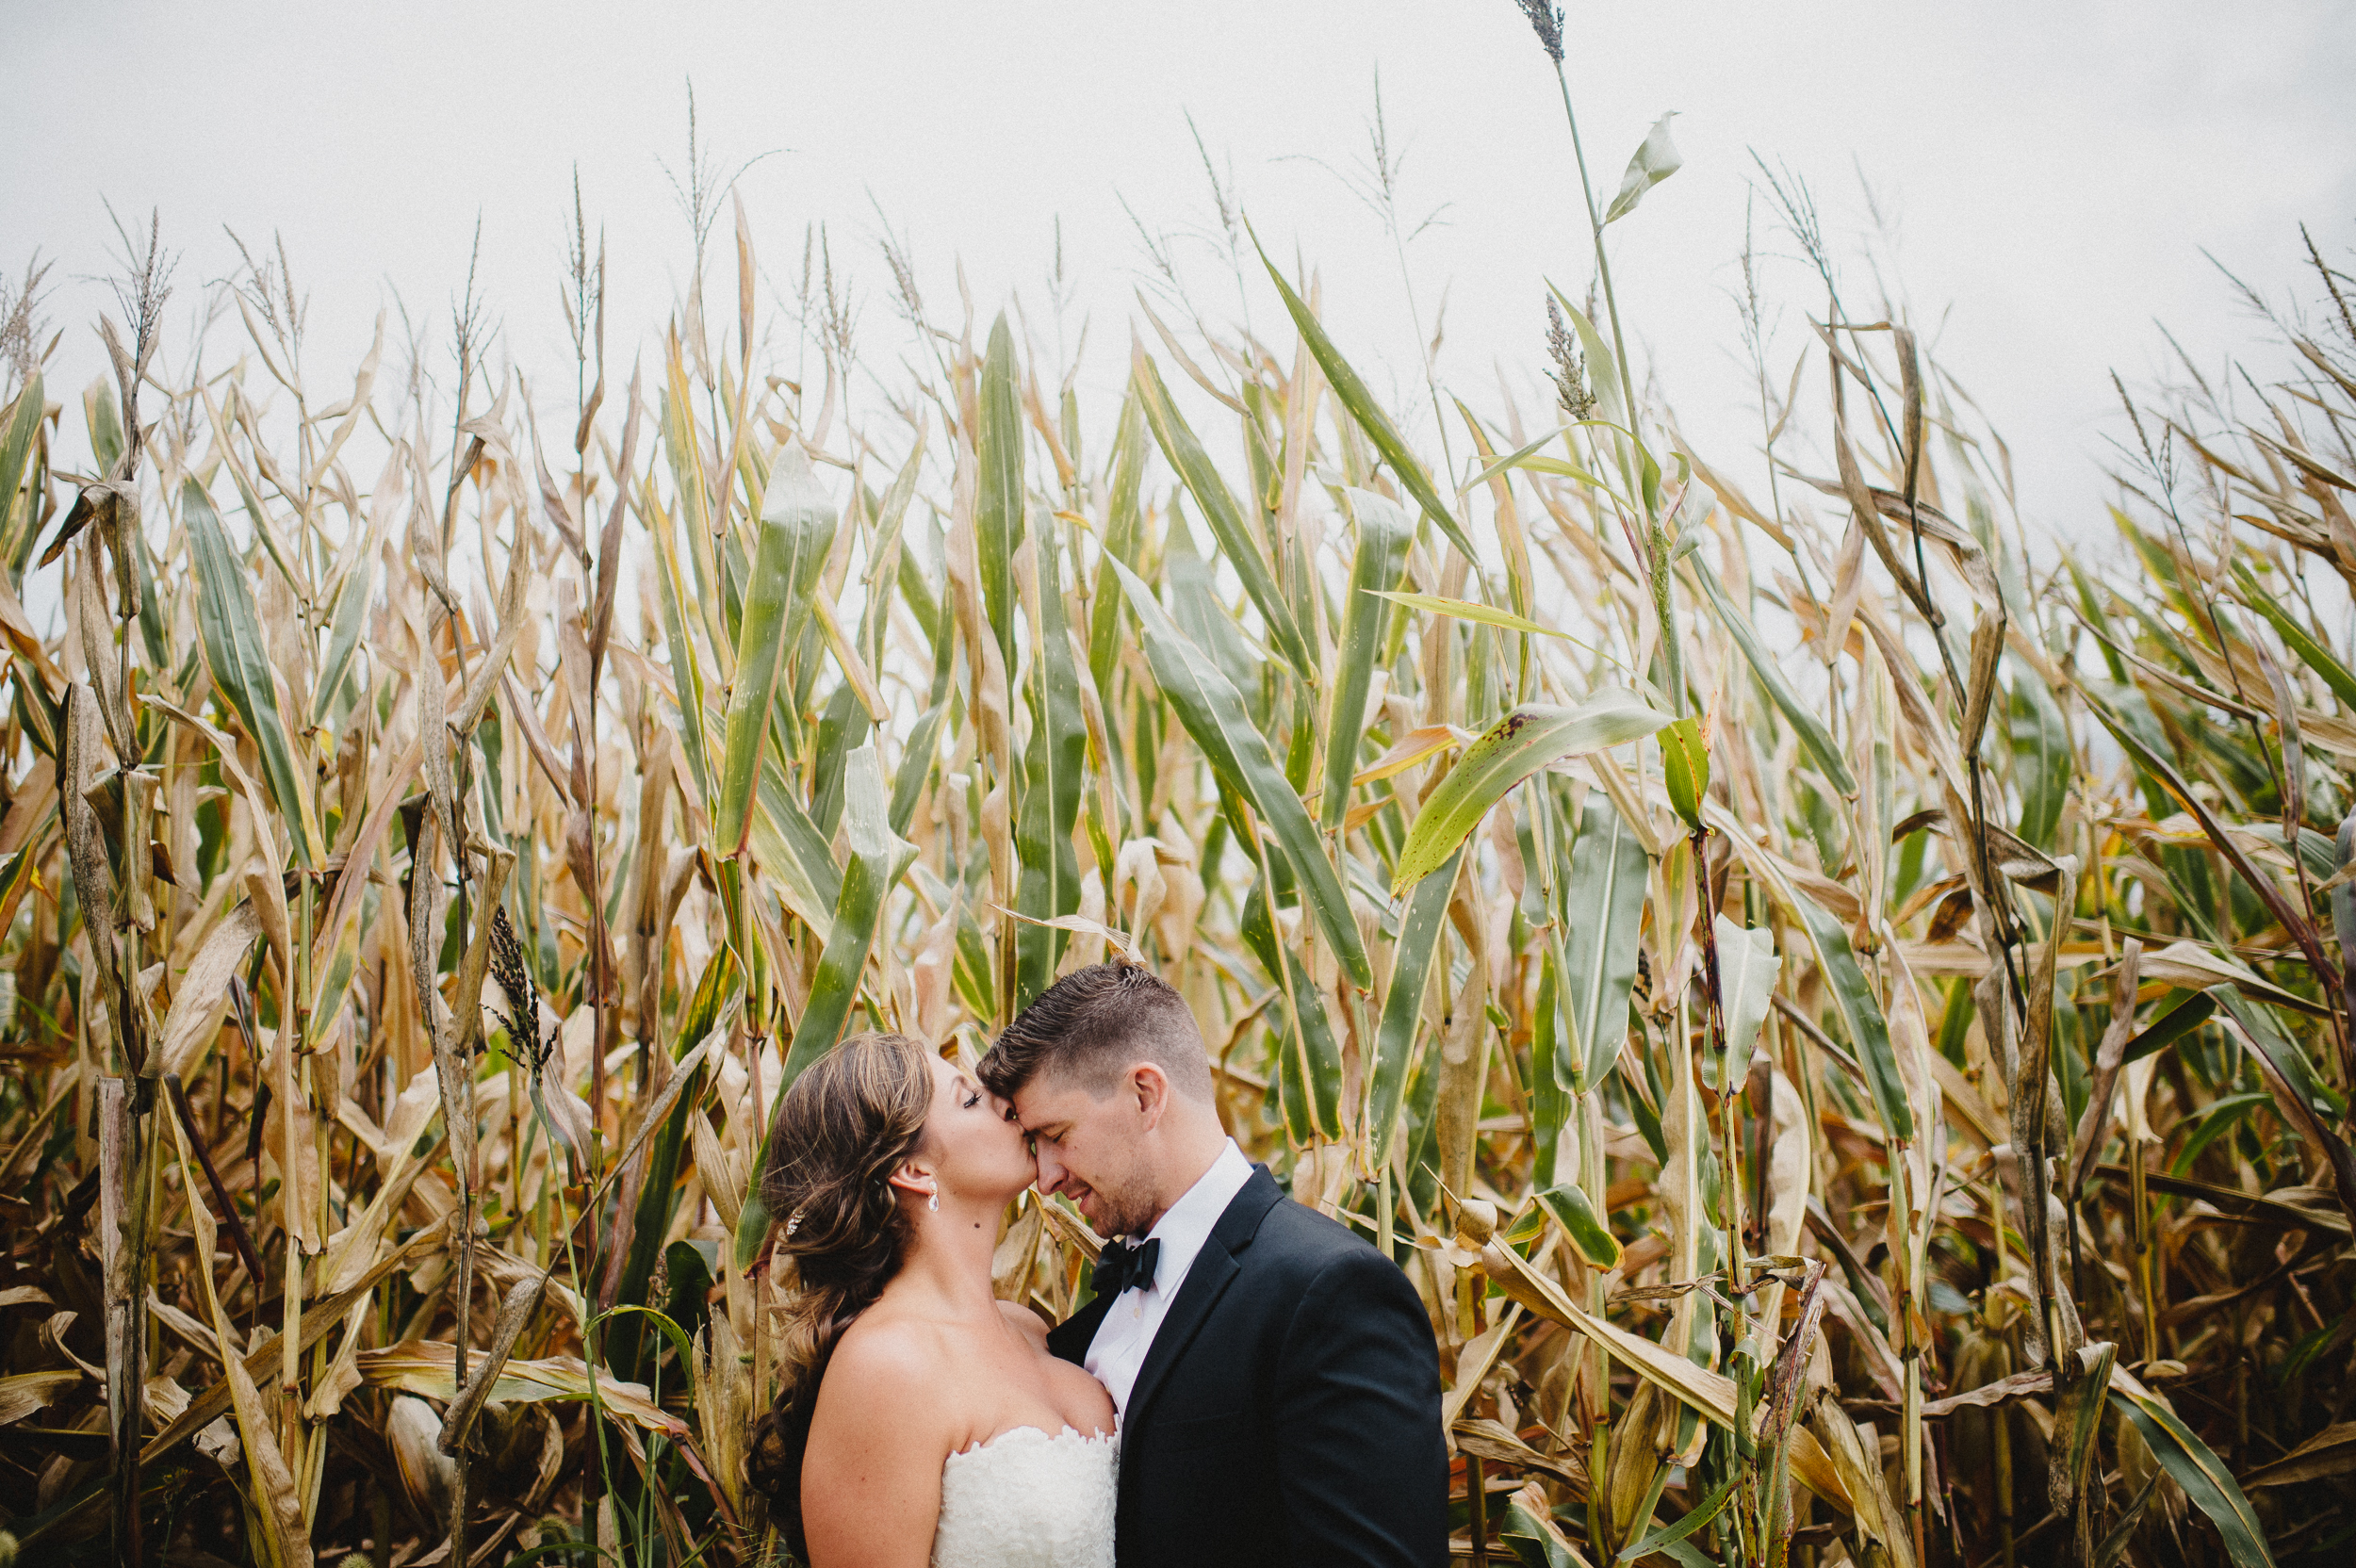 delaware-estate-wedding-photographer-pat-robinson-photography-59.jpg